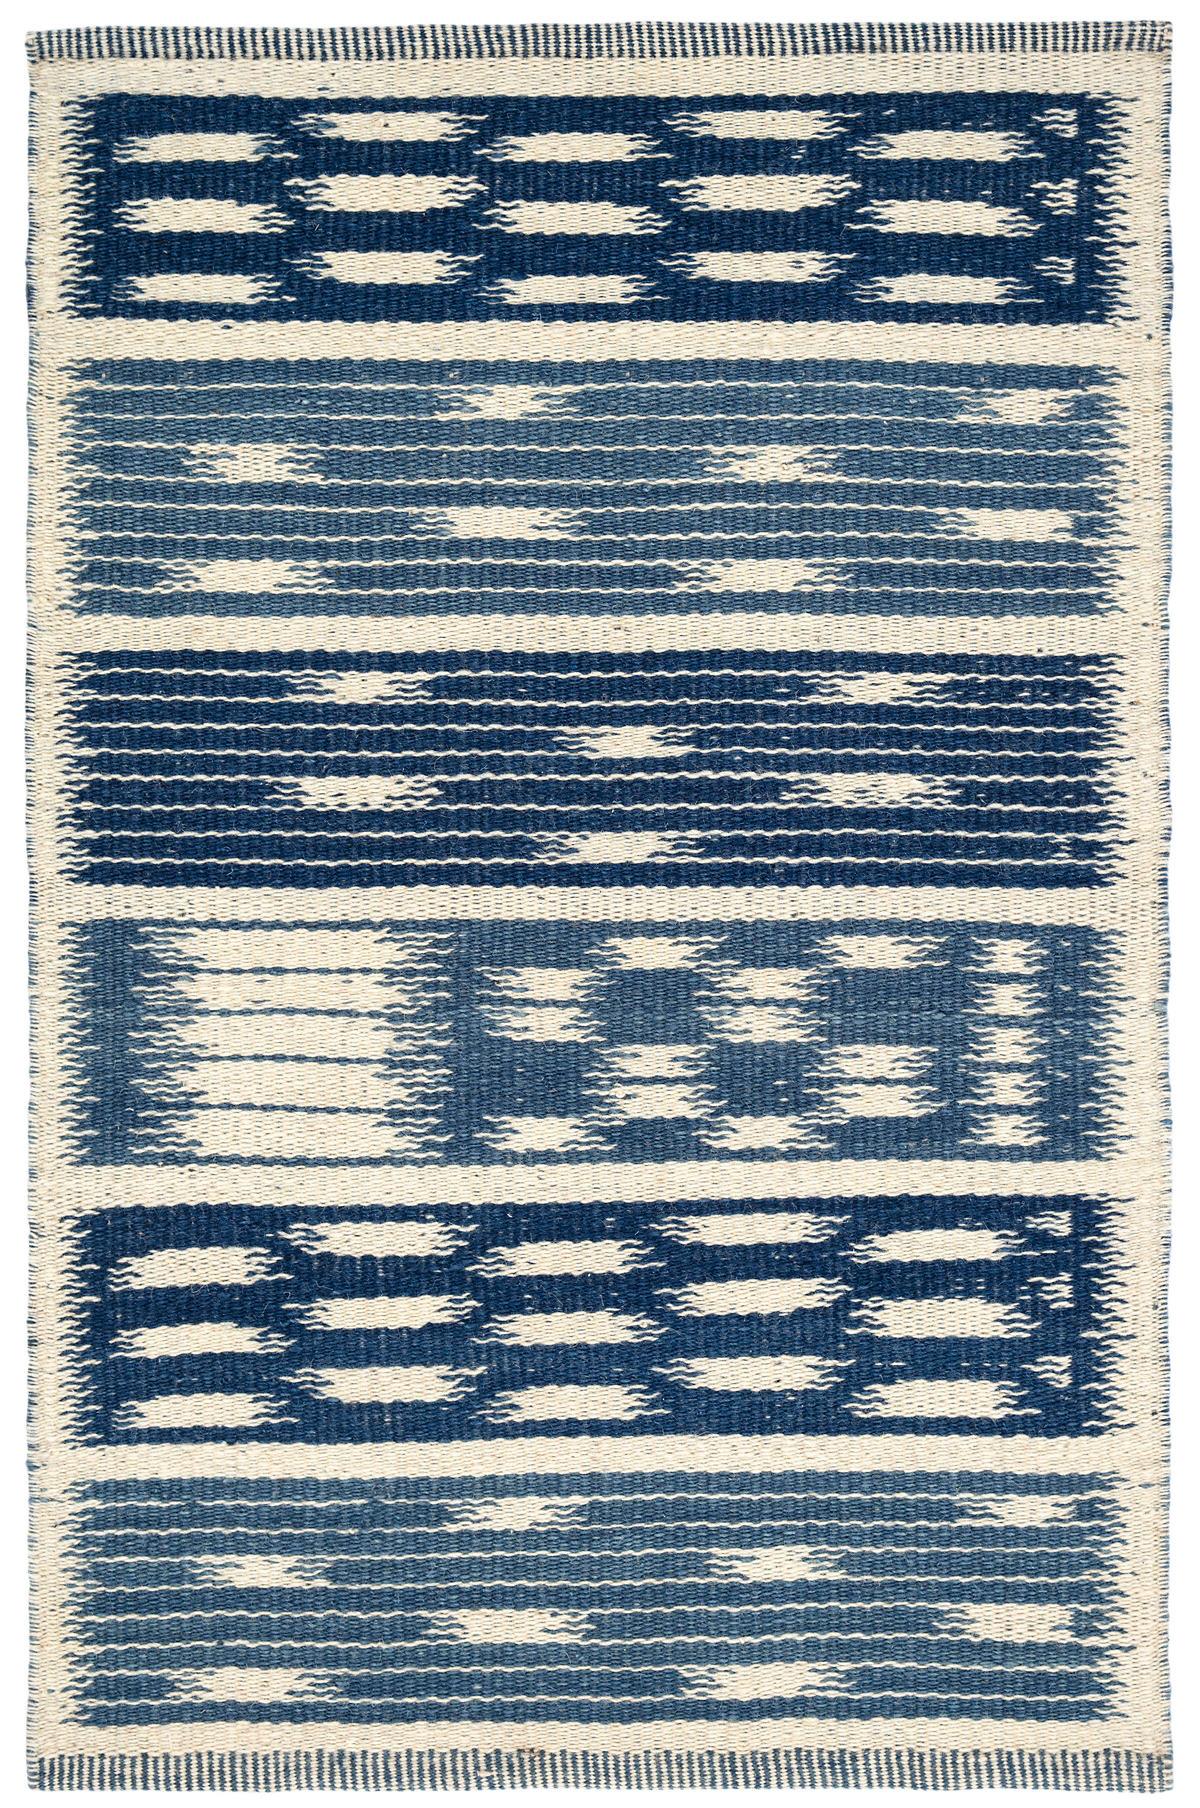 Big Sur Woven Wool Rug